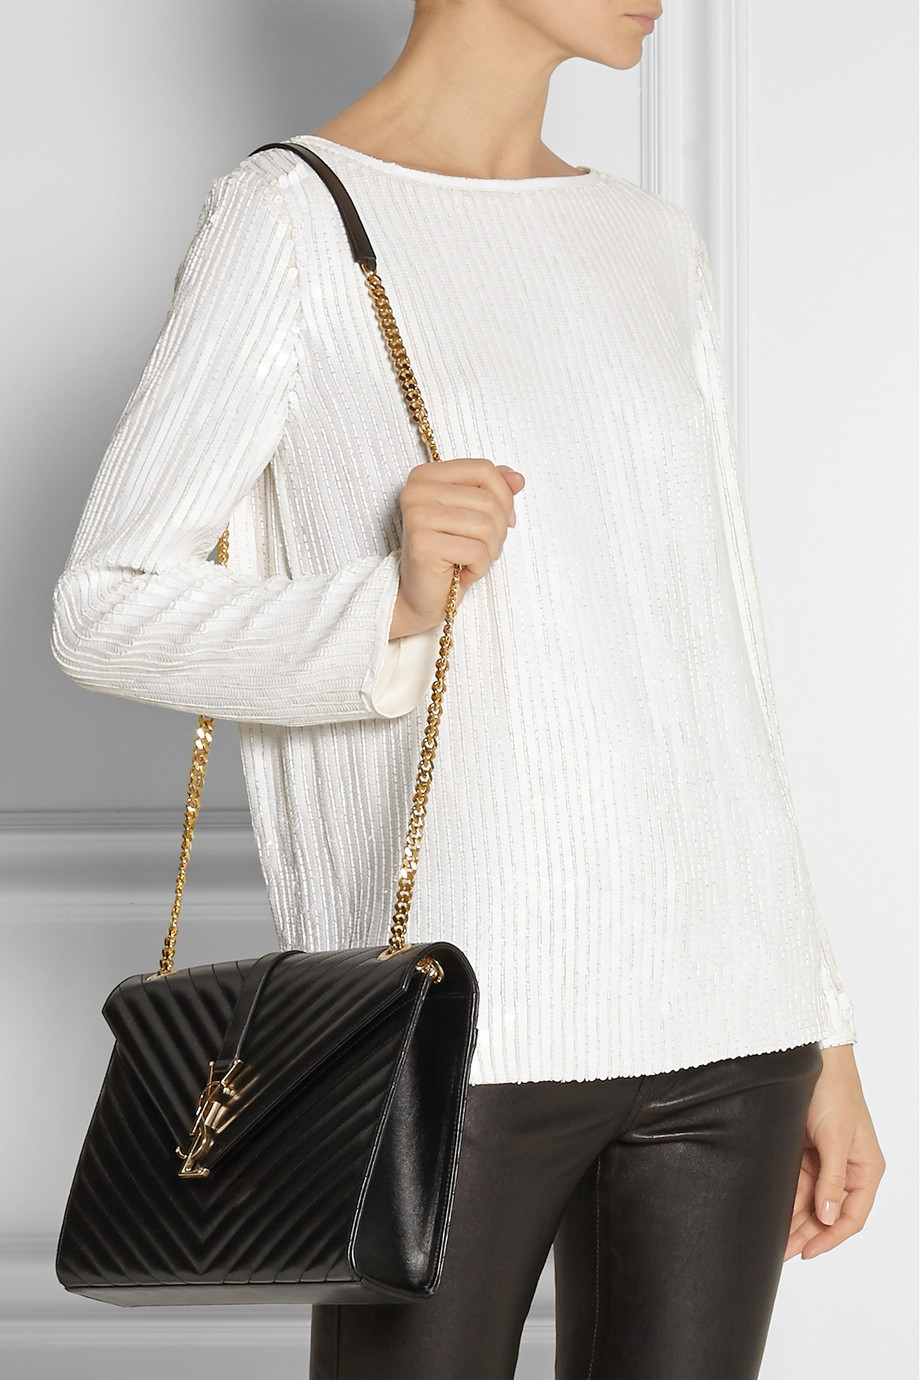 Monogram Matelasse Shoulder Bag Black Redtag Handbags